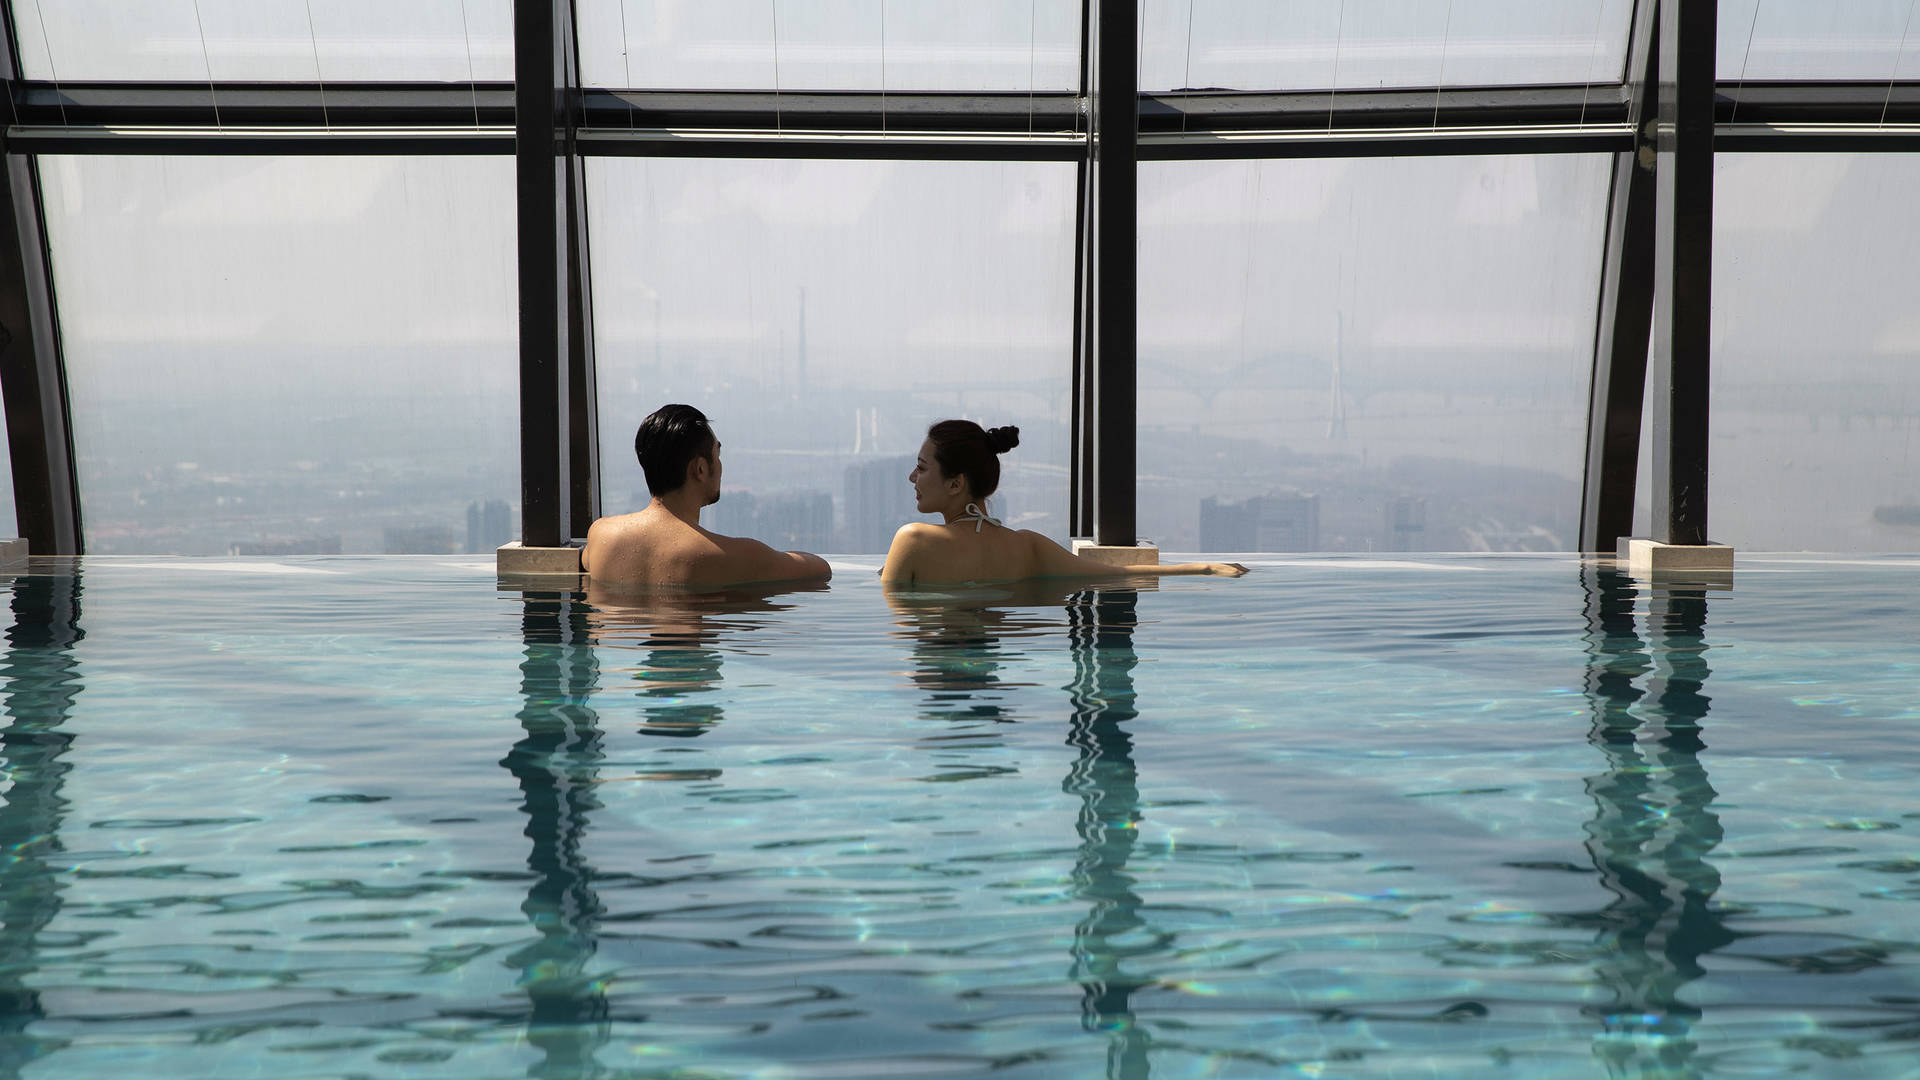 Jumeirah Nanjing leisure couple in the pool_16-9